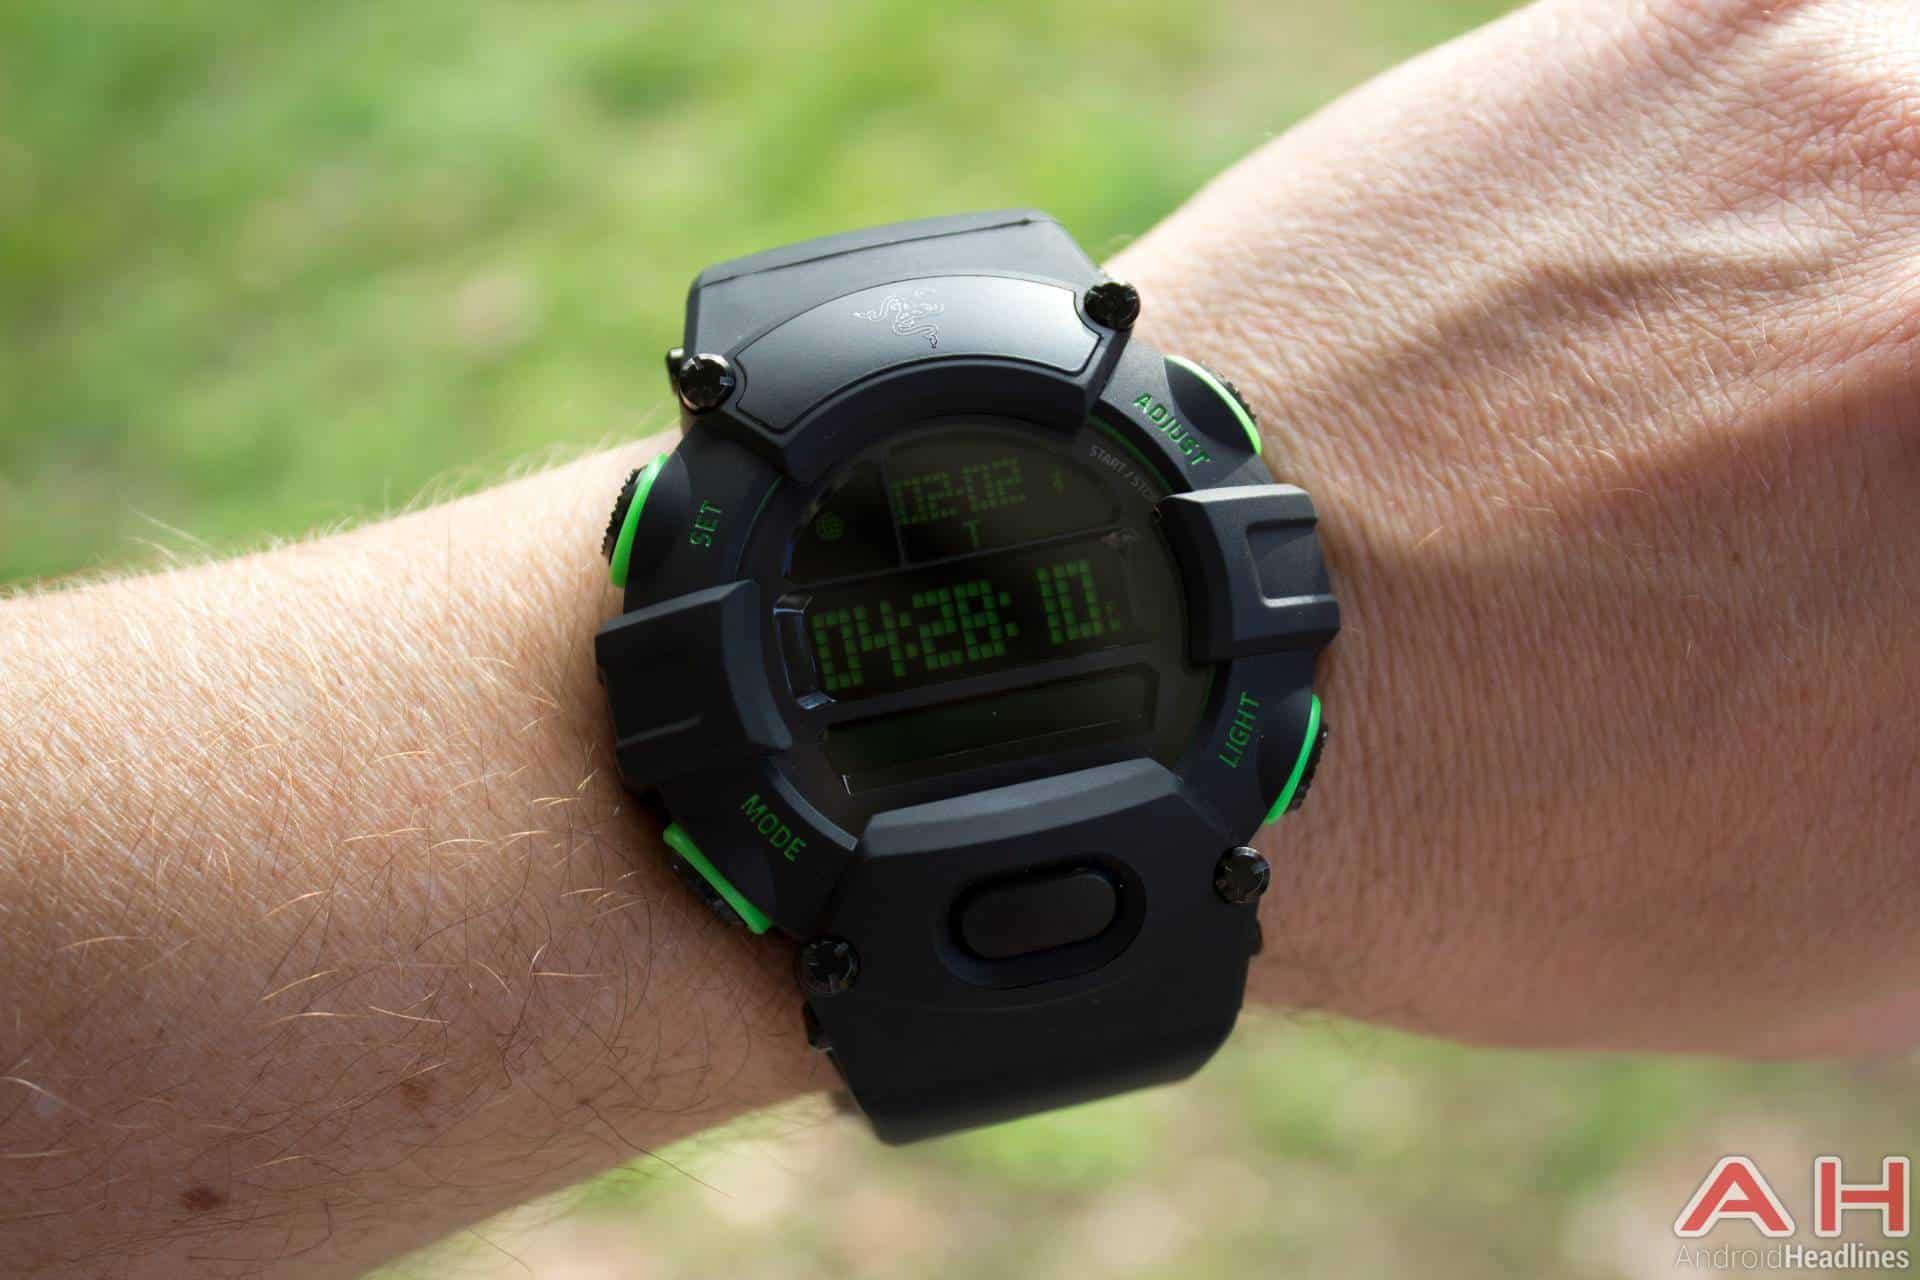 Razer-Nabu-Watch-AH-NS-01